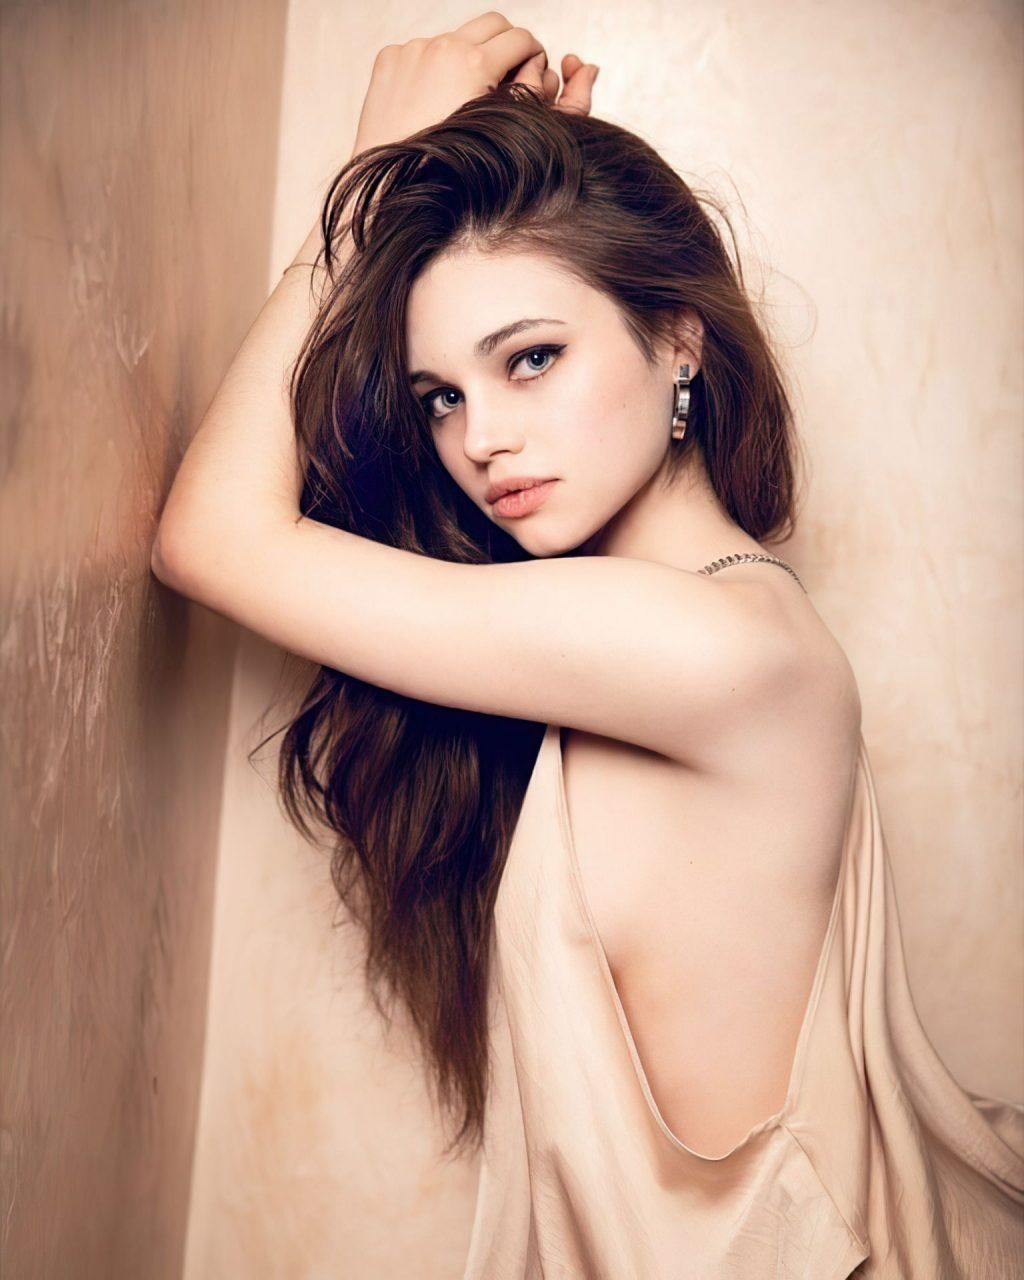 India Eisley Hot (14 Photos)